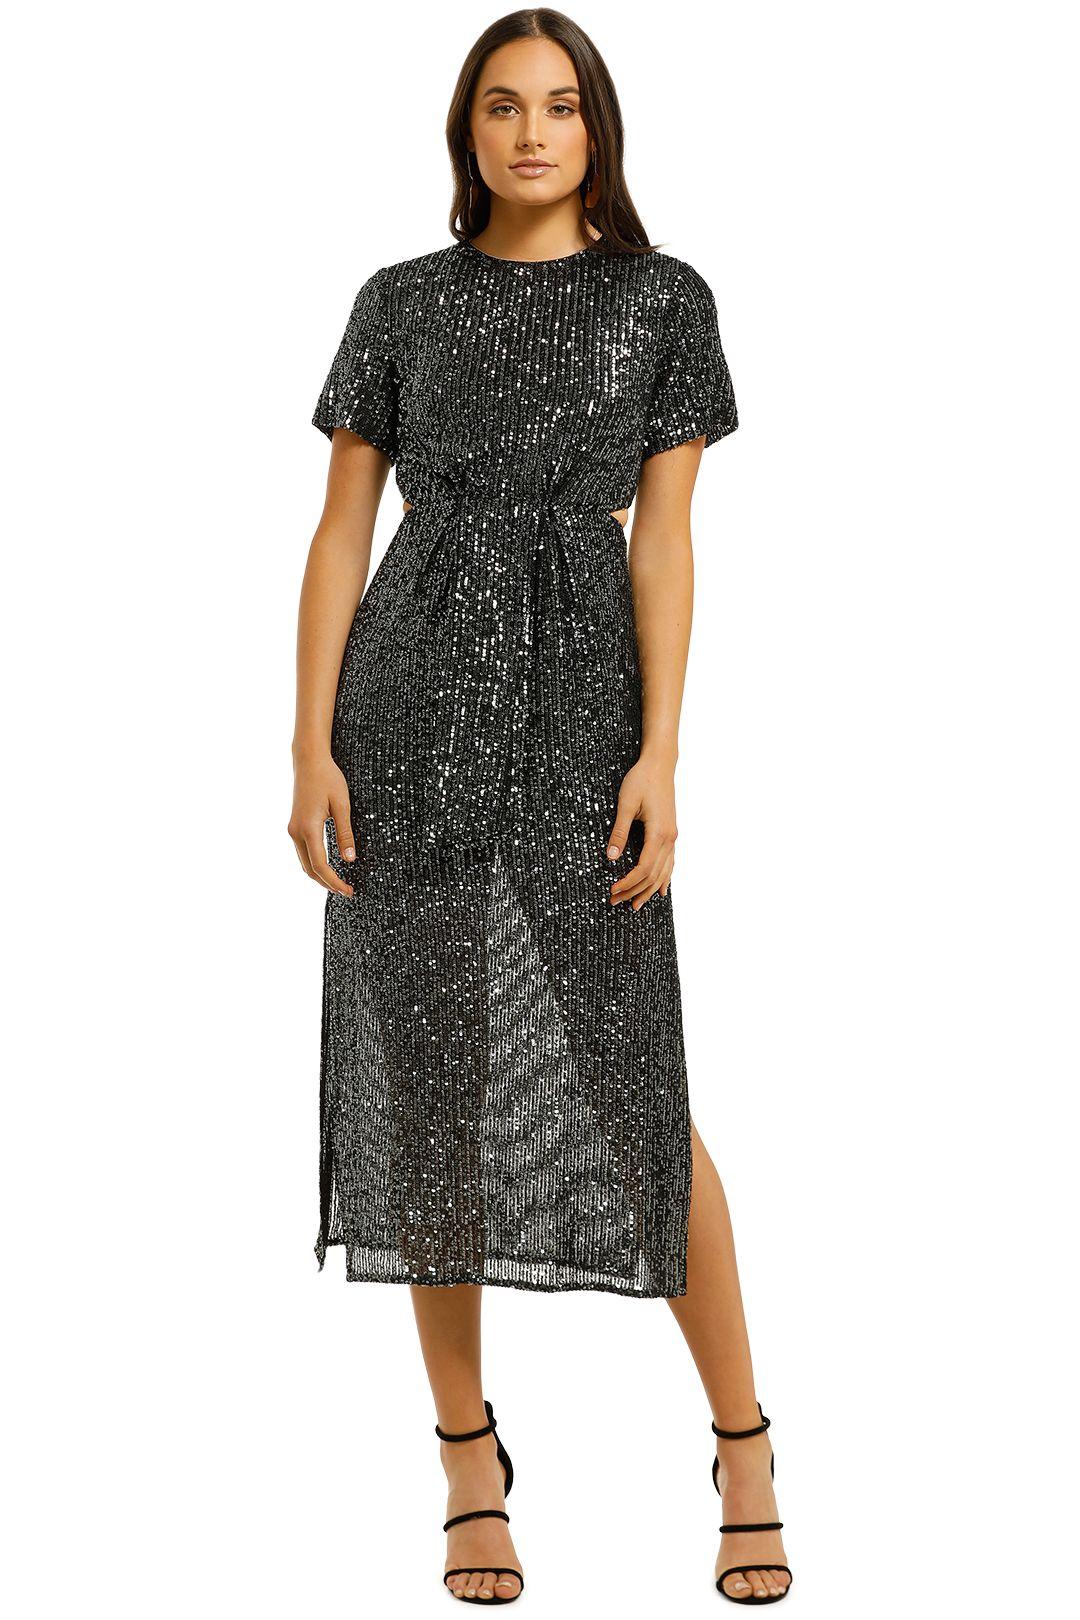 CMEO-Collective-Lustre-Midi-Dress-Black-Sequin-Front